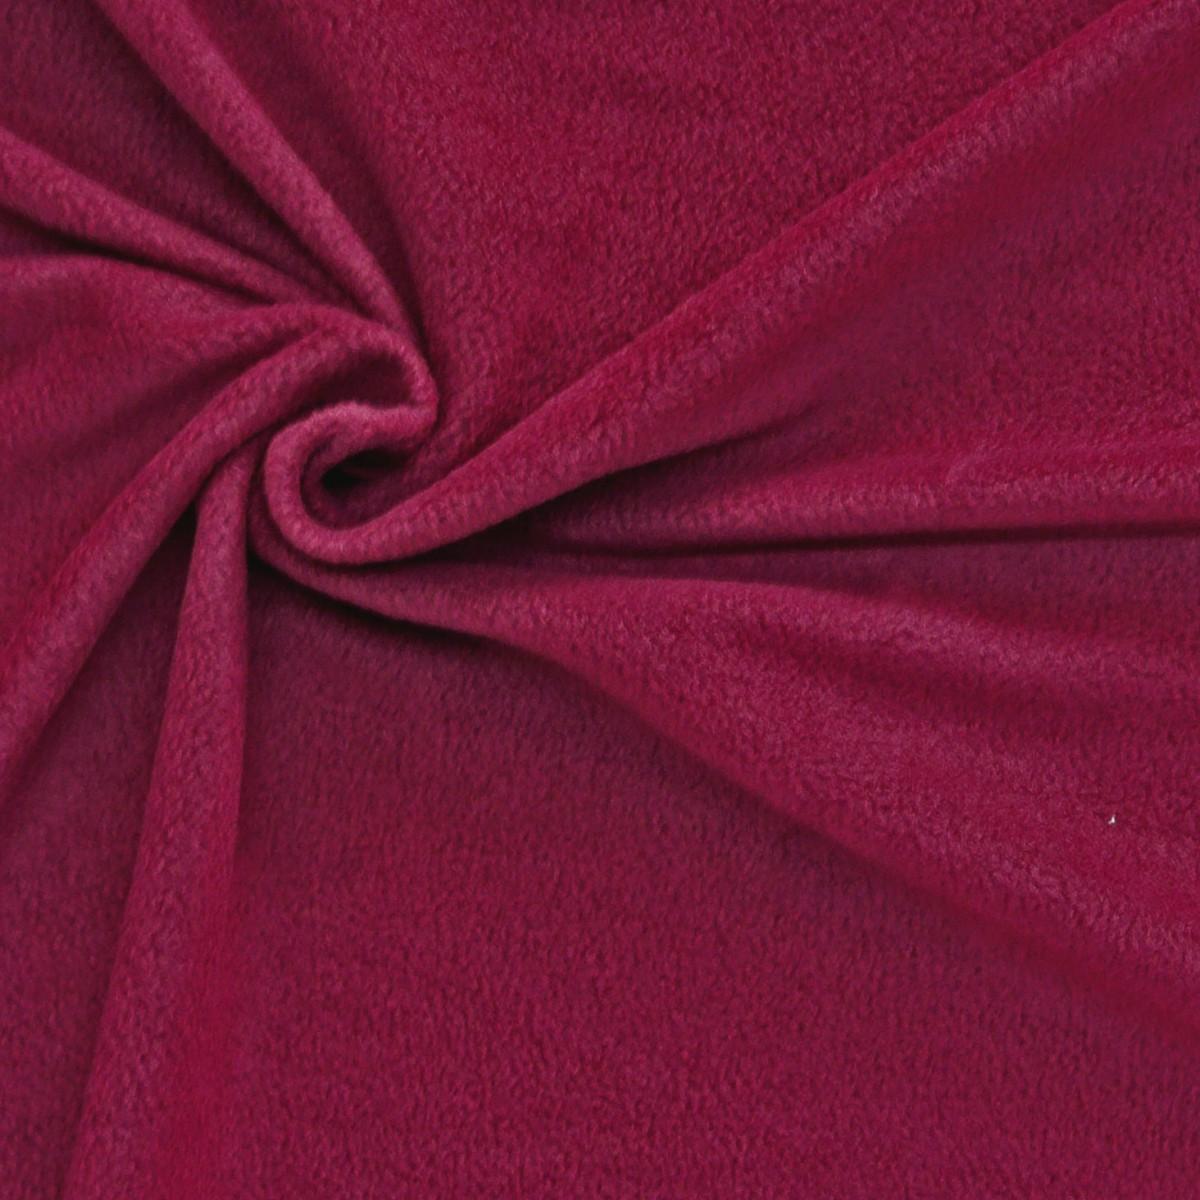 polar fleece stoffe fleecestoff fuchsia stoffe zubeh r stoffe stoffe uni. Black Bedroom Furniture Sets. Home Design Ideas